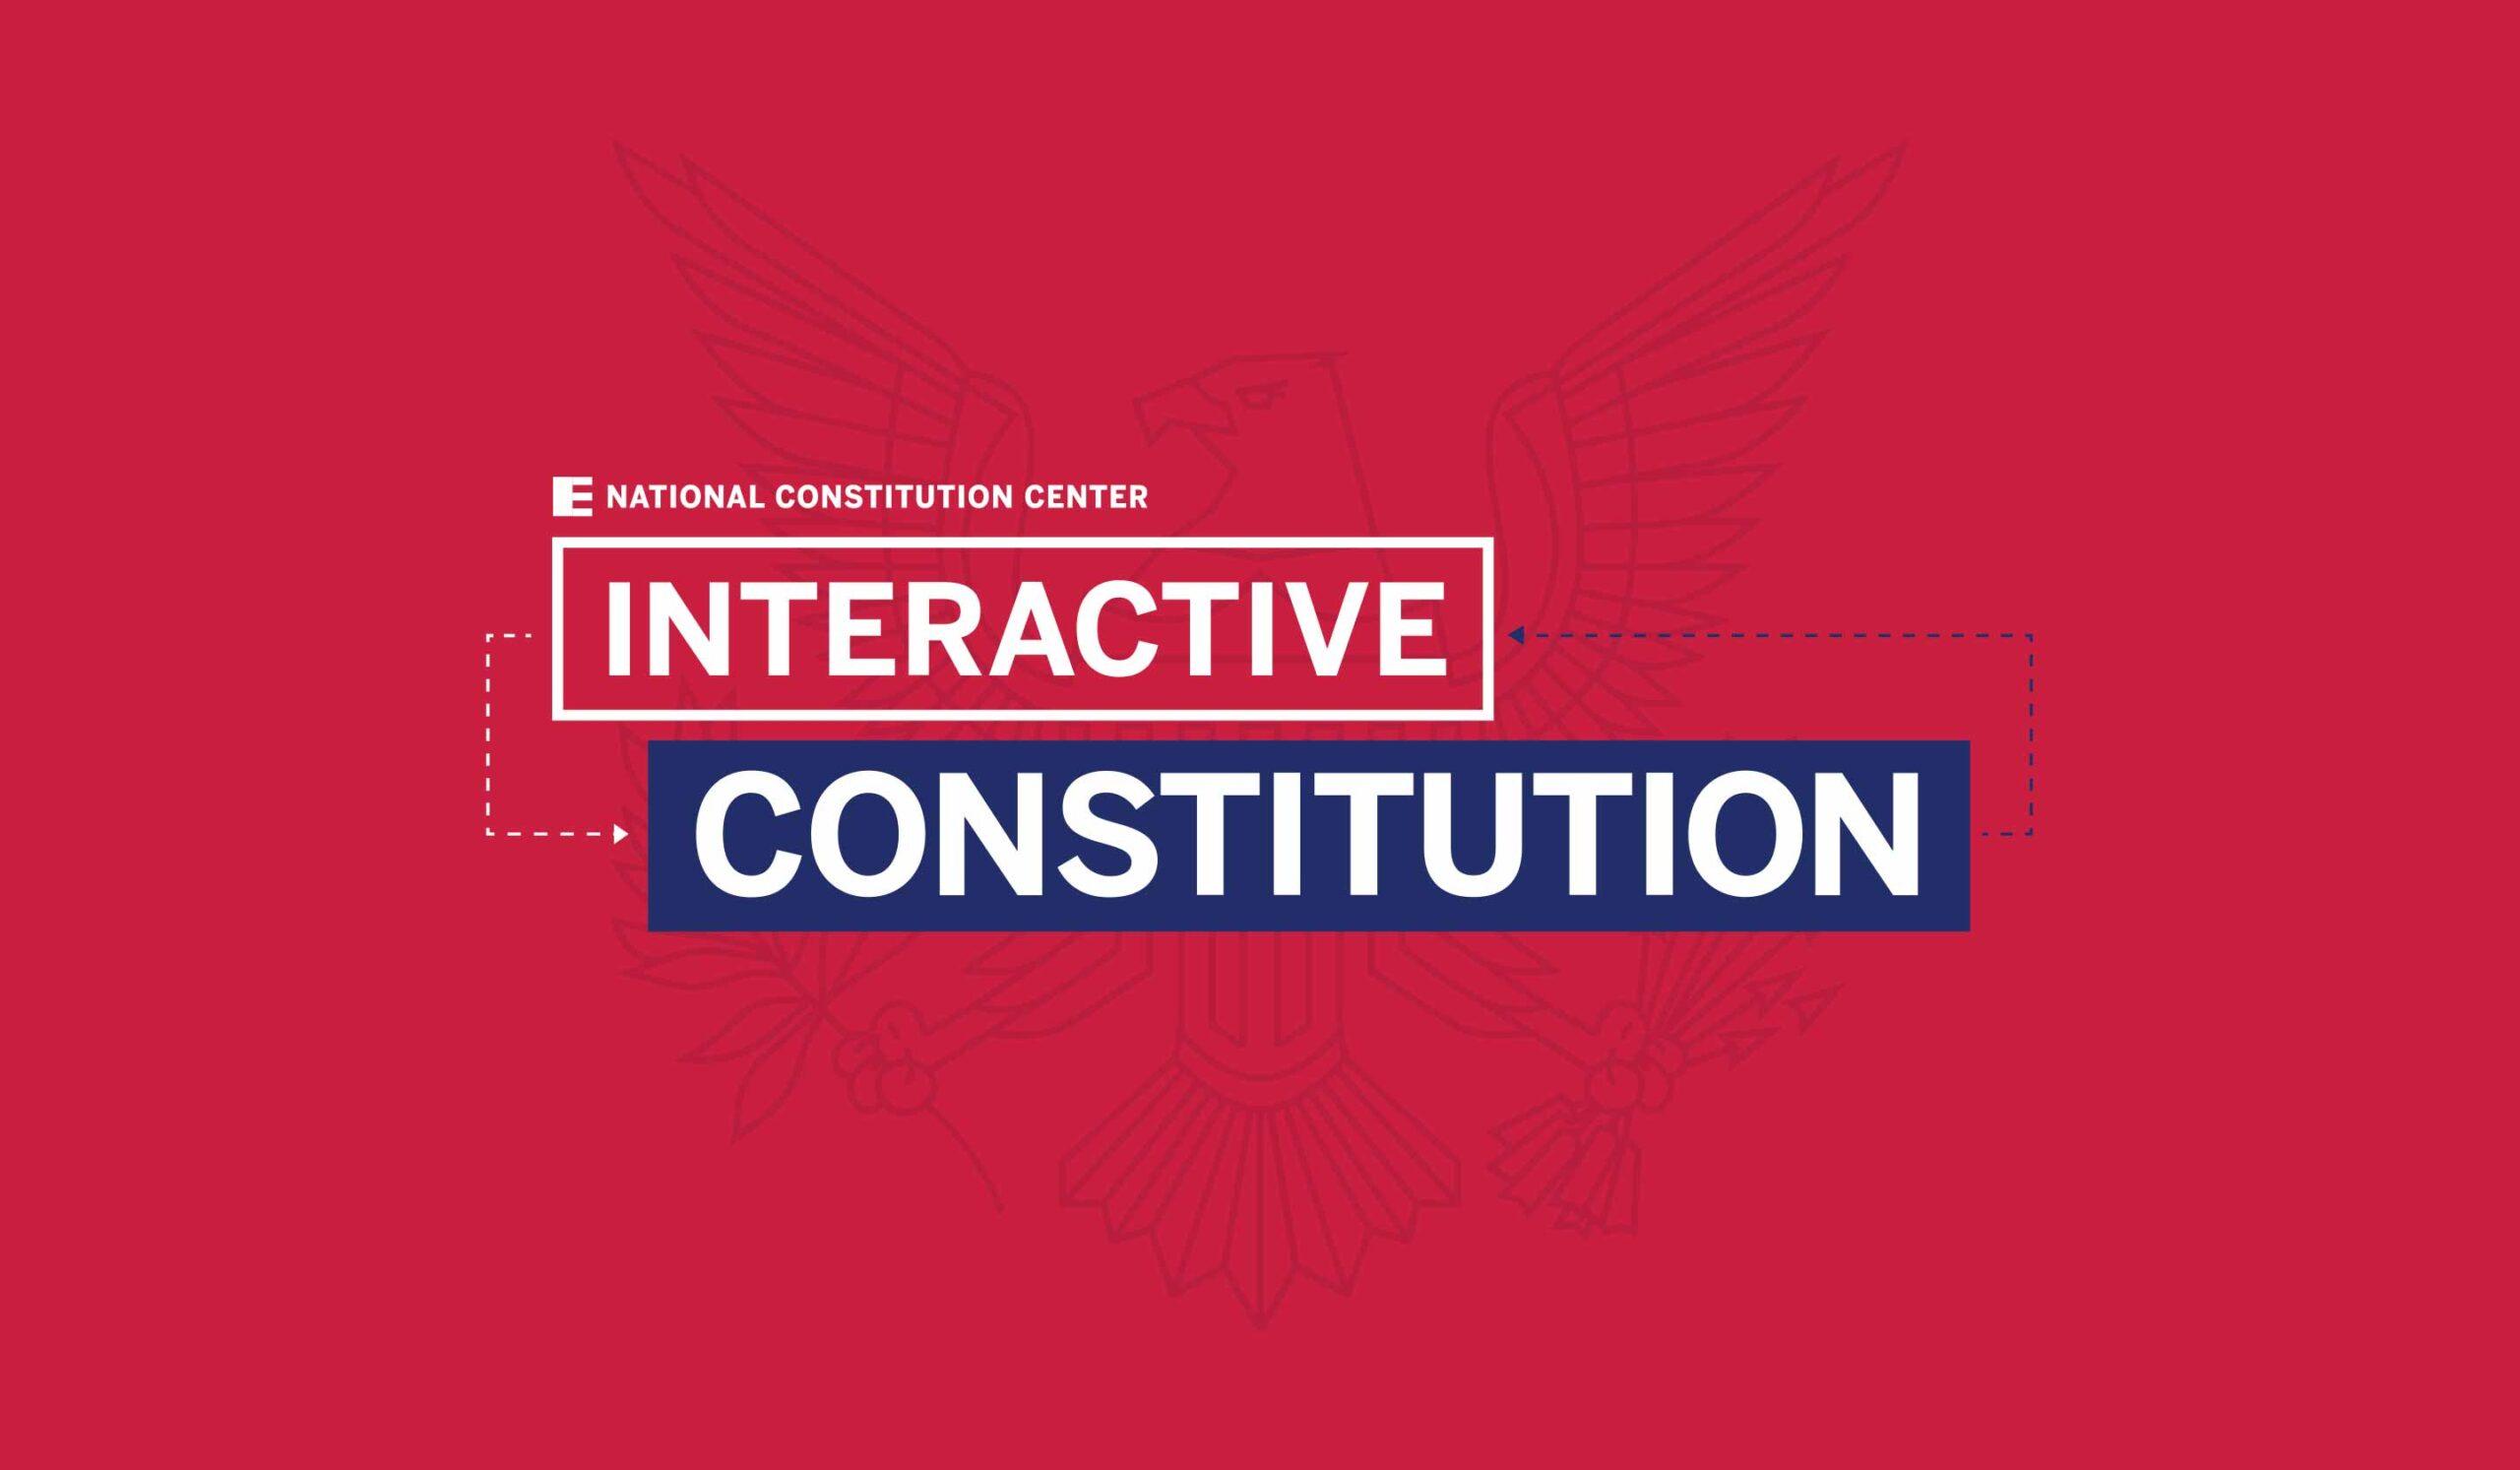 National-Constitution-Center-Interactive-Constitution